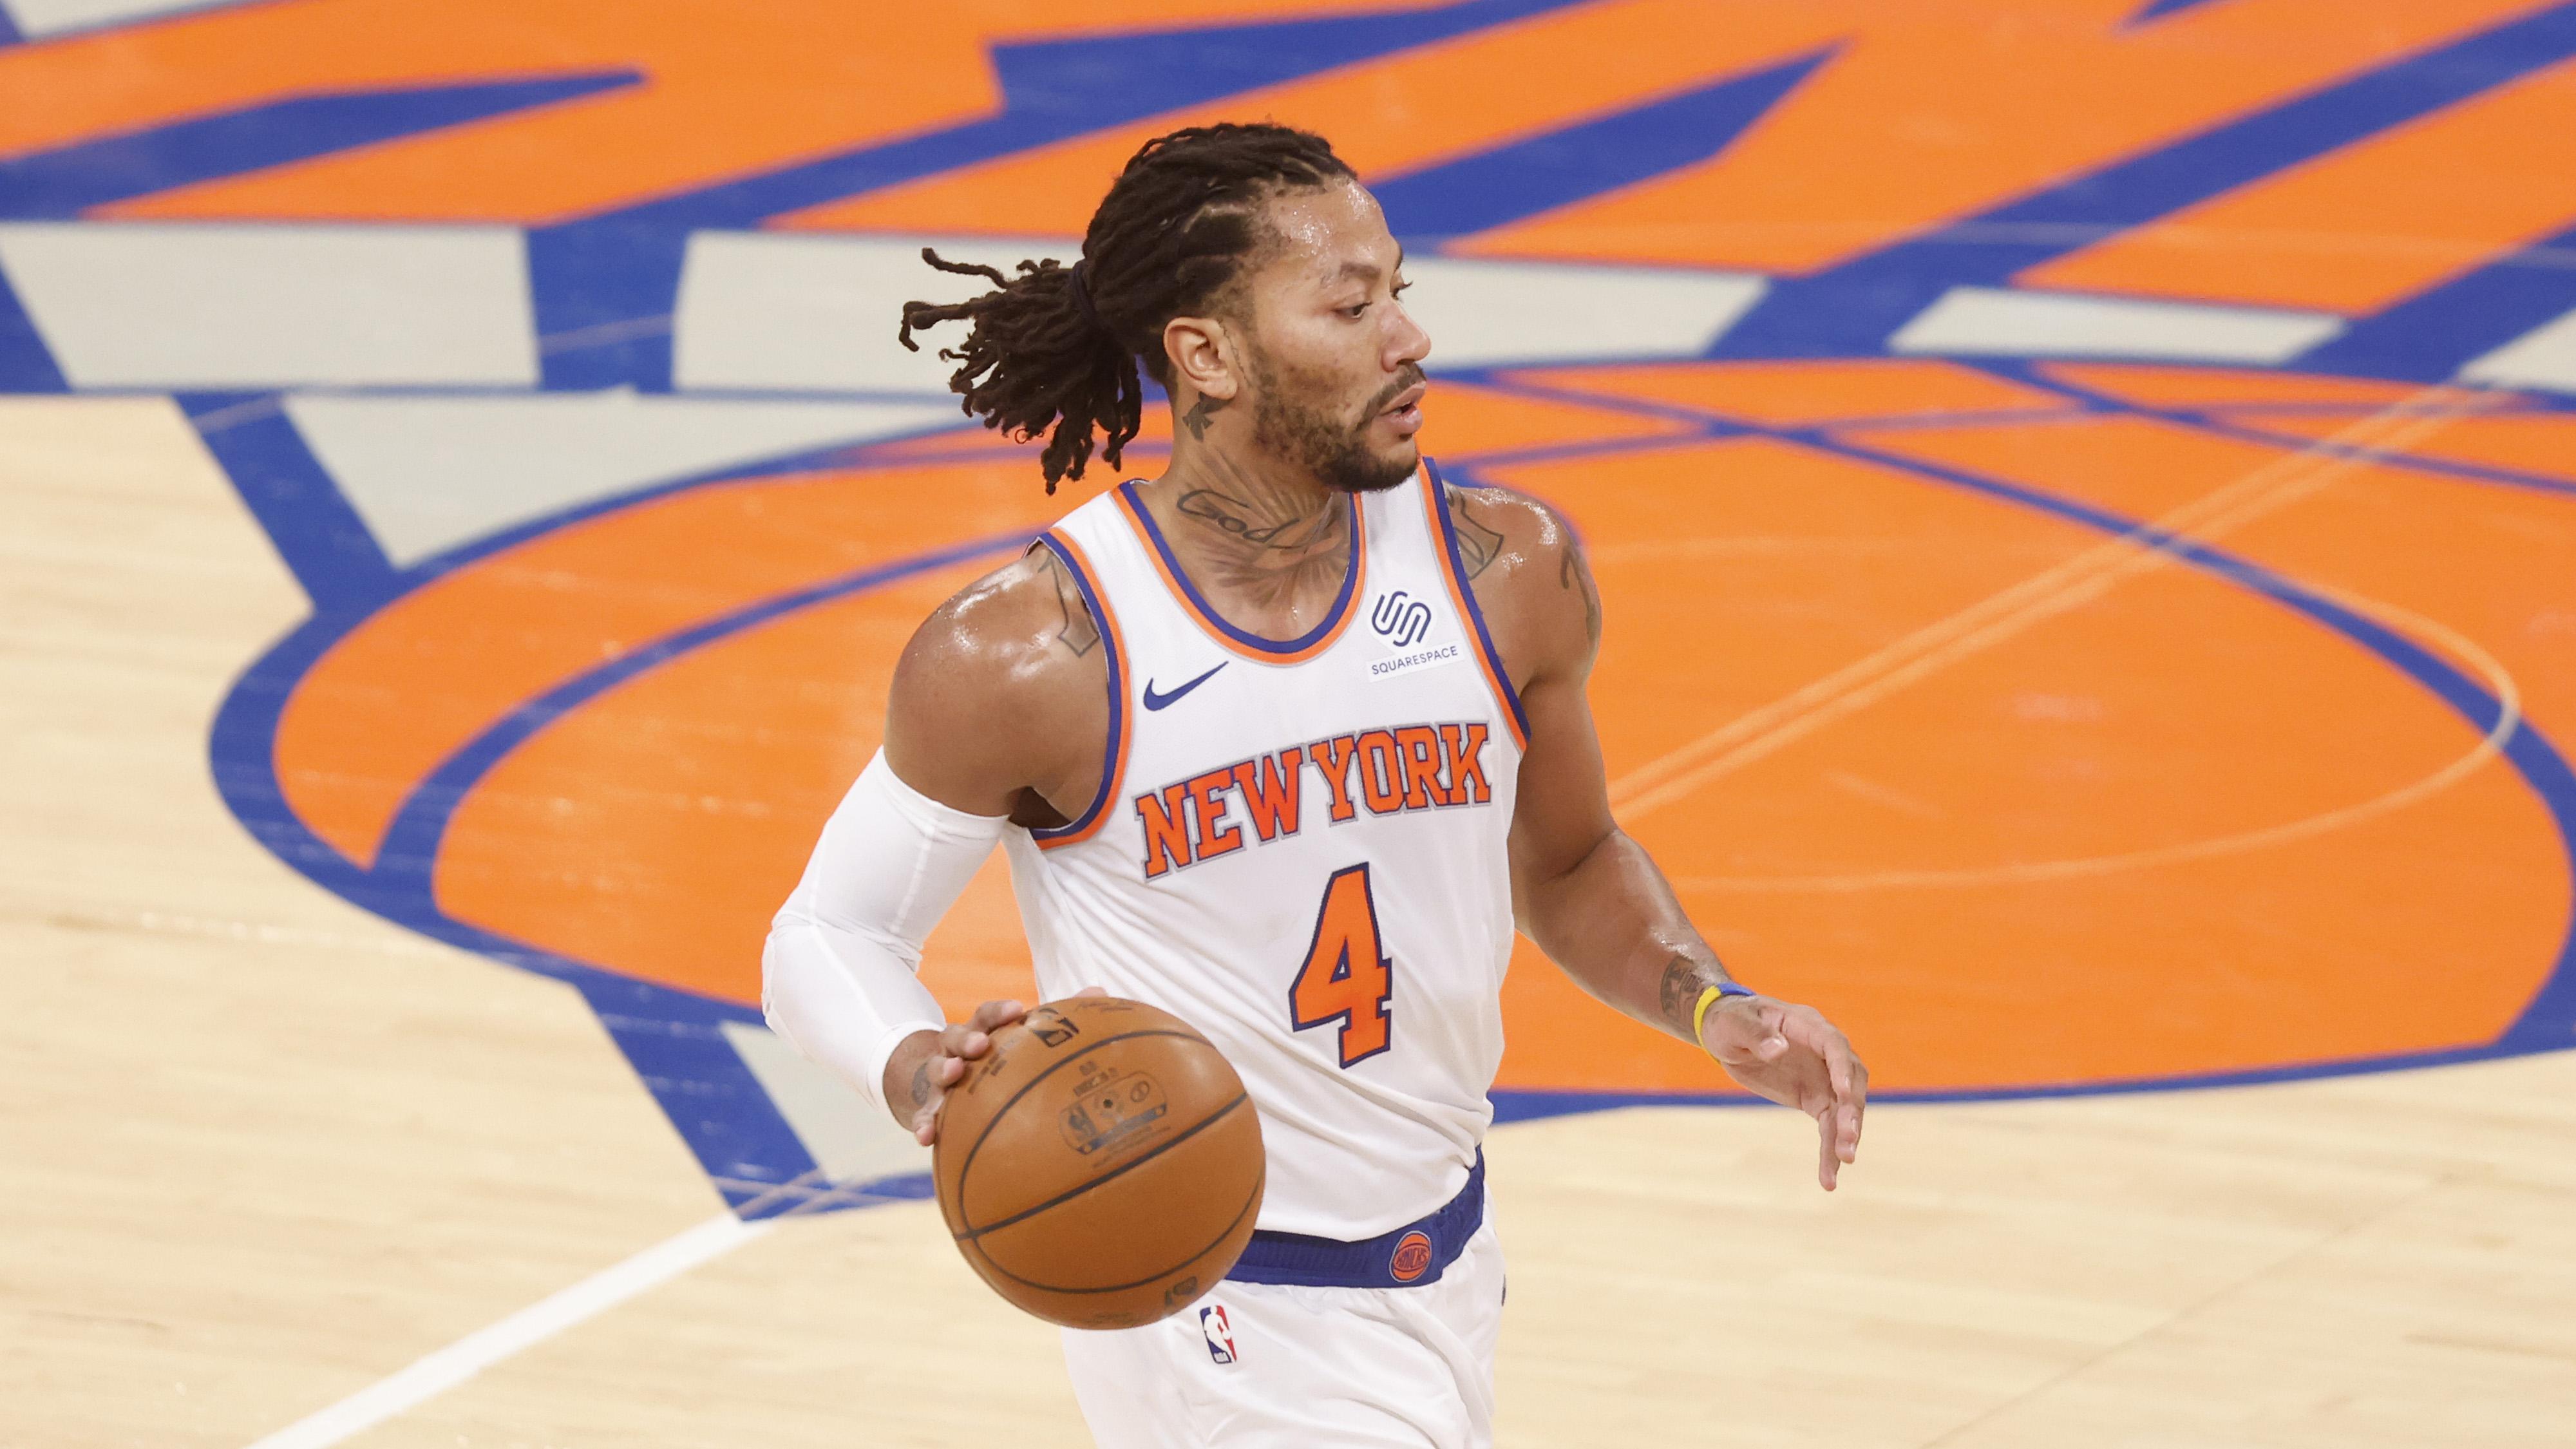 Feb 15, 2021; New York, New York, USA; New York Knicks' Derrick Rose (4) advances the ball against the Atlanta Hawks during the second quarter at Madison Square Garden.